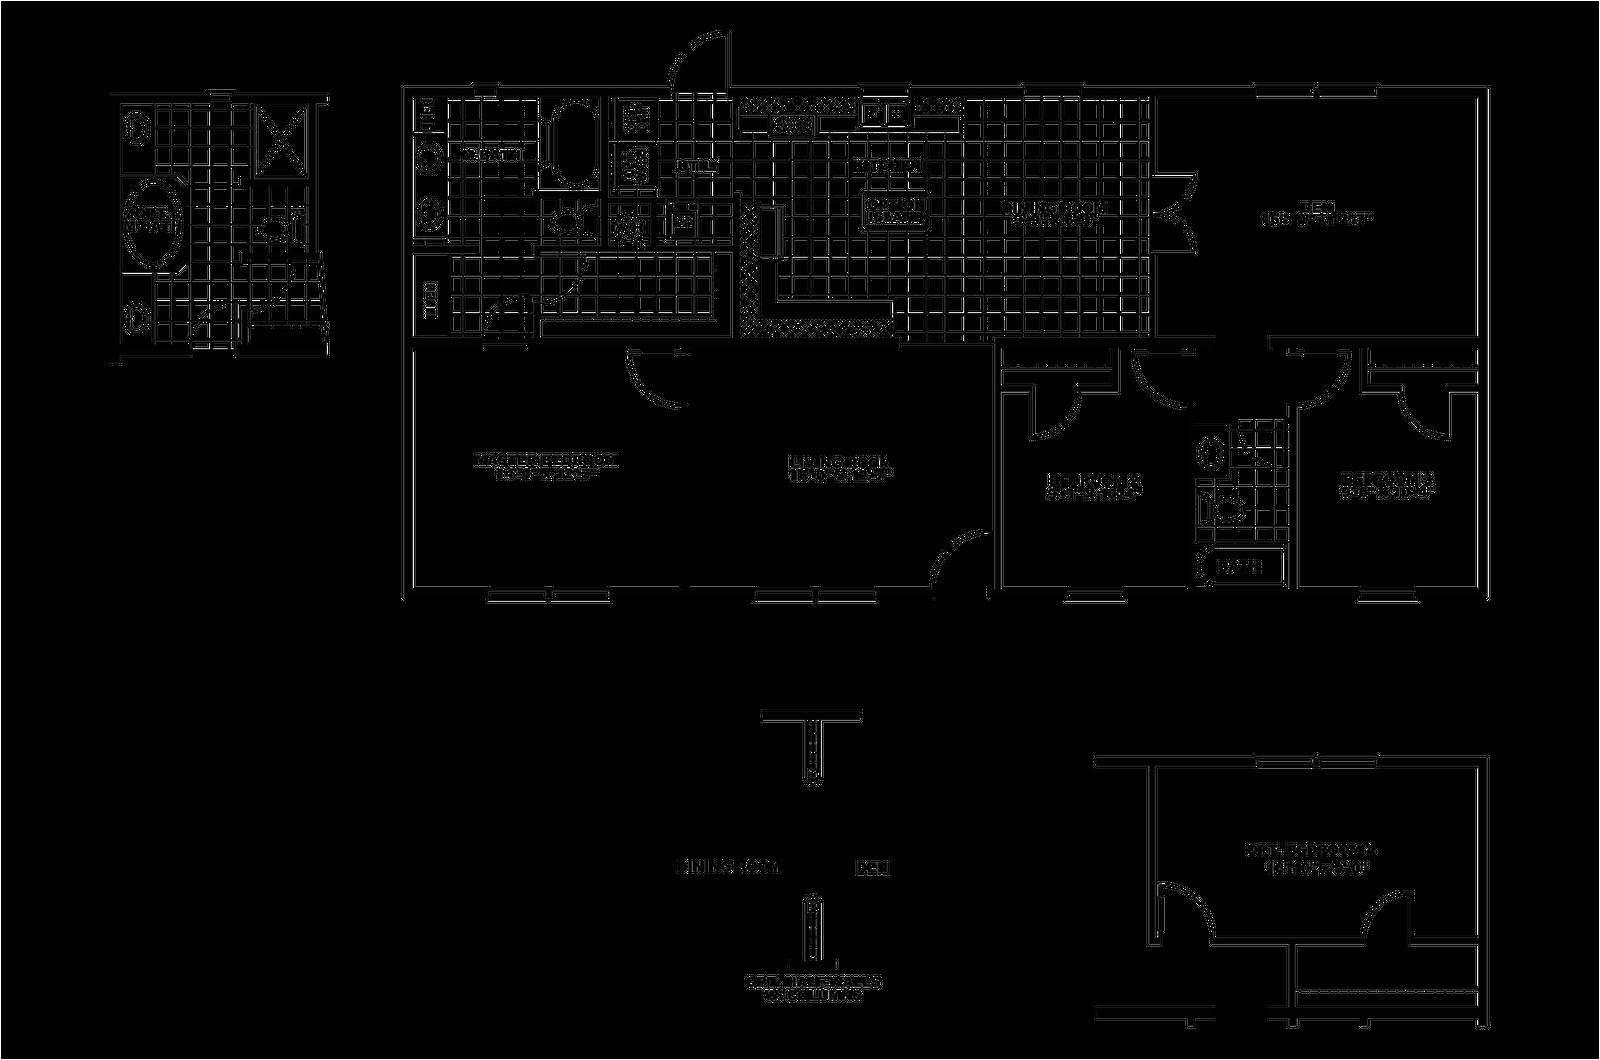 1999 skyline mobile home floor plans